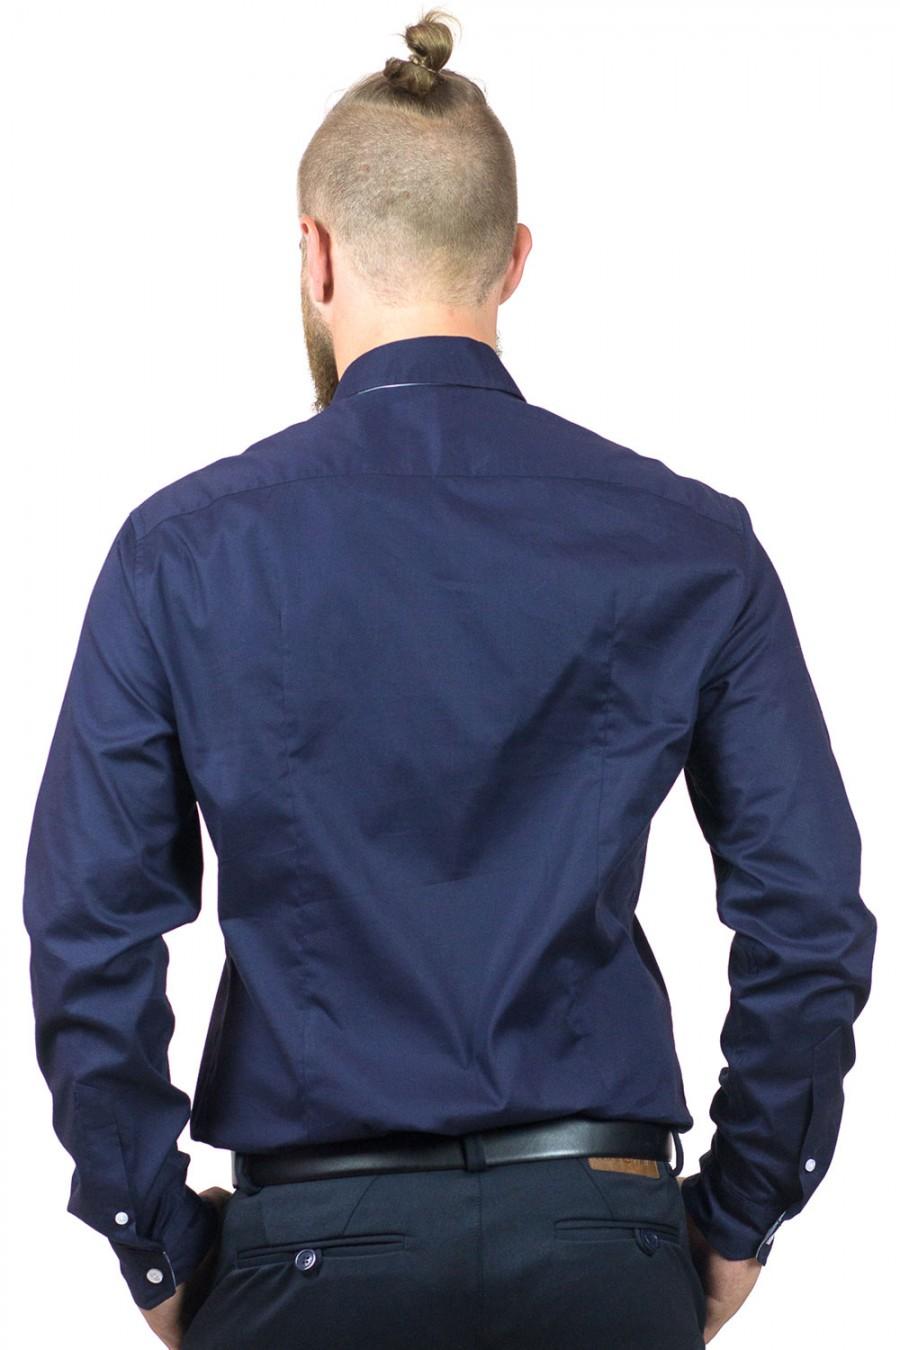 Мужская рубашка S-119-6